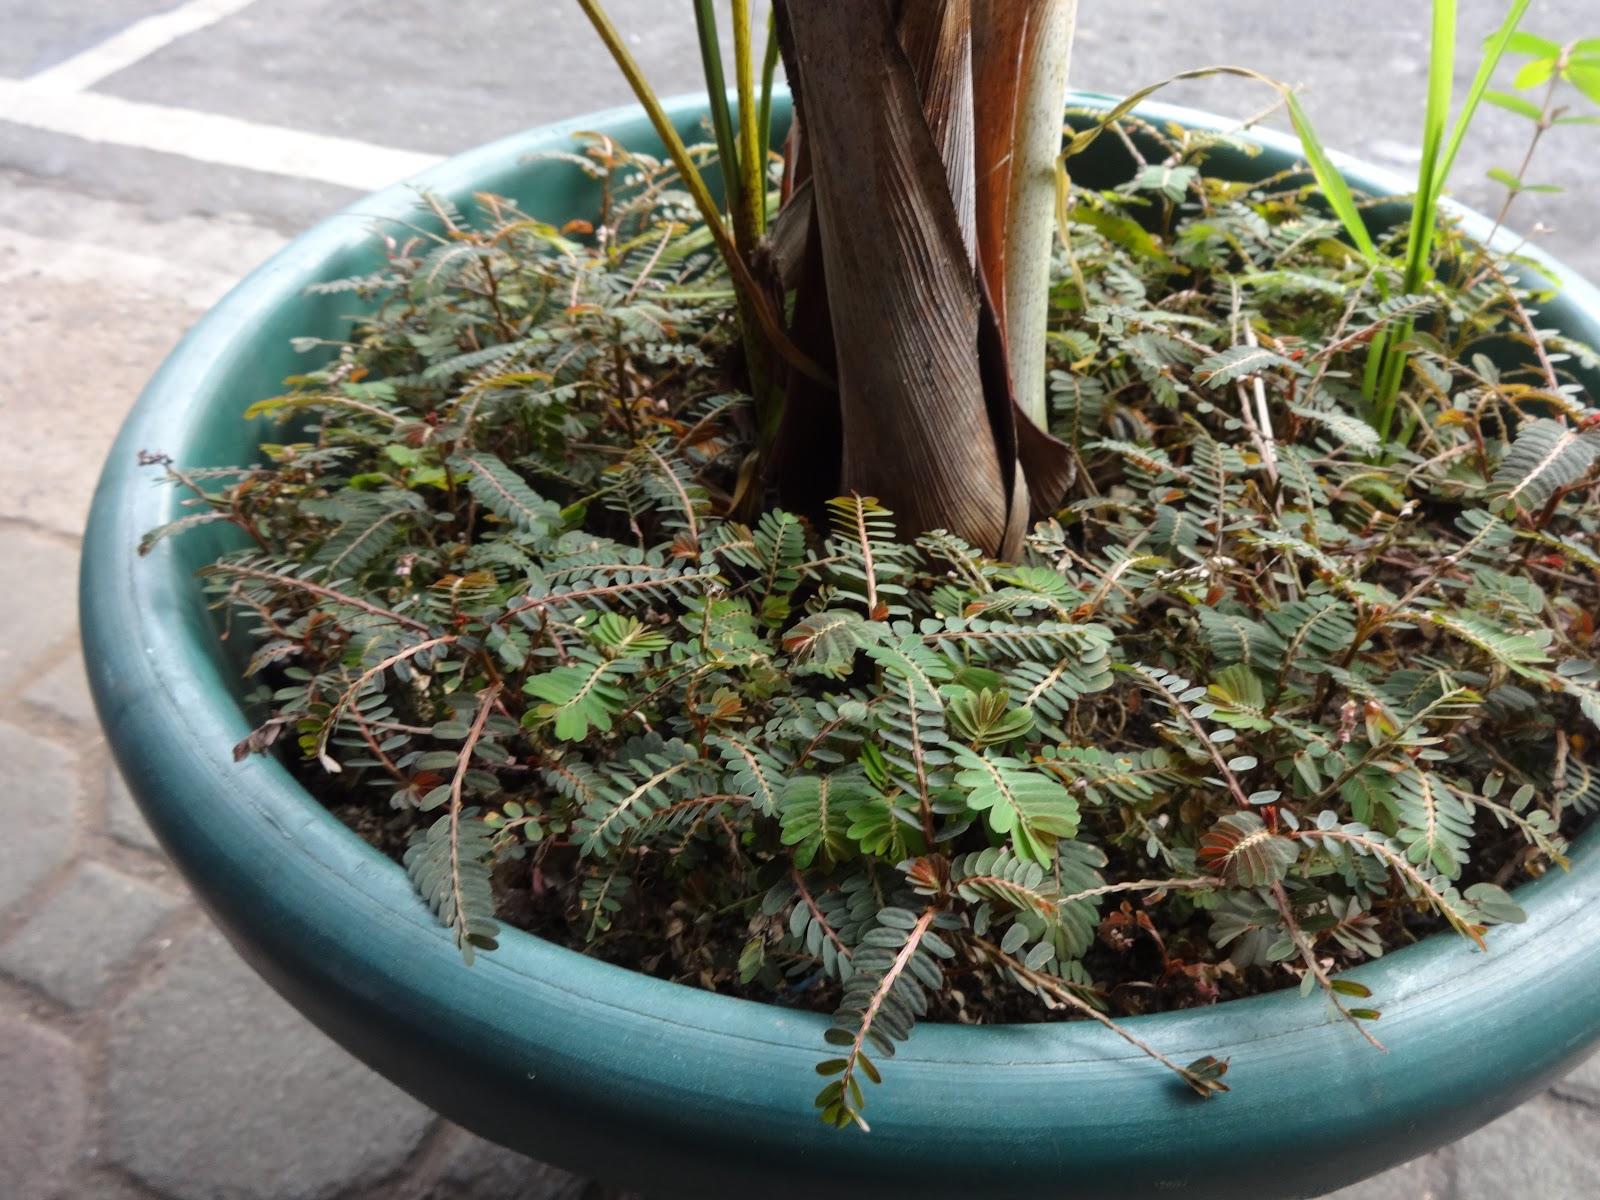 Phyllanthus niruri for hepatitis b